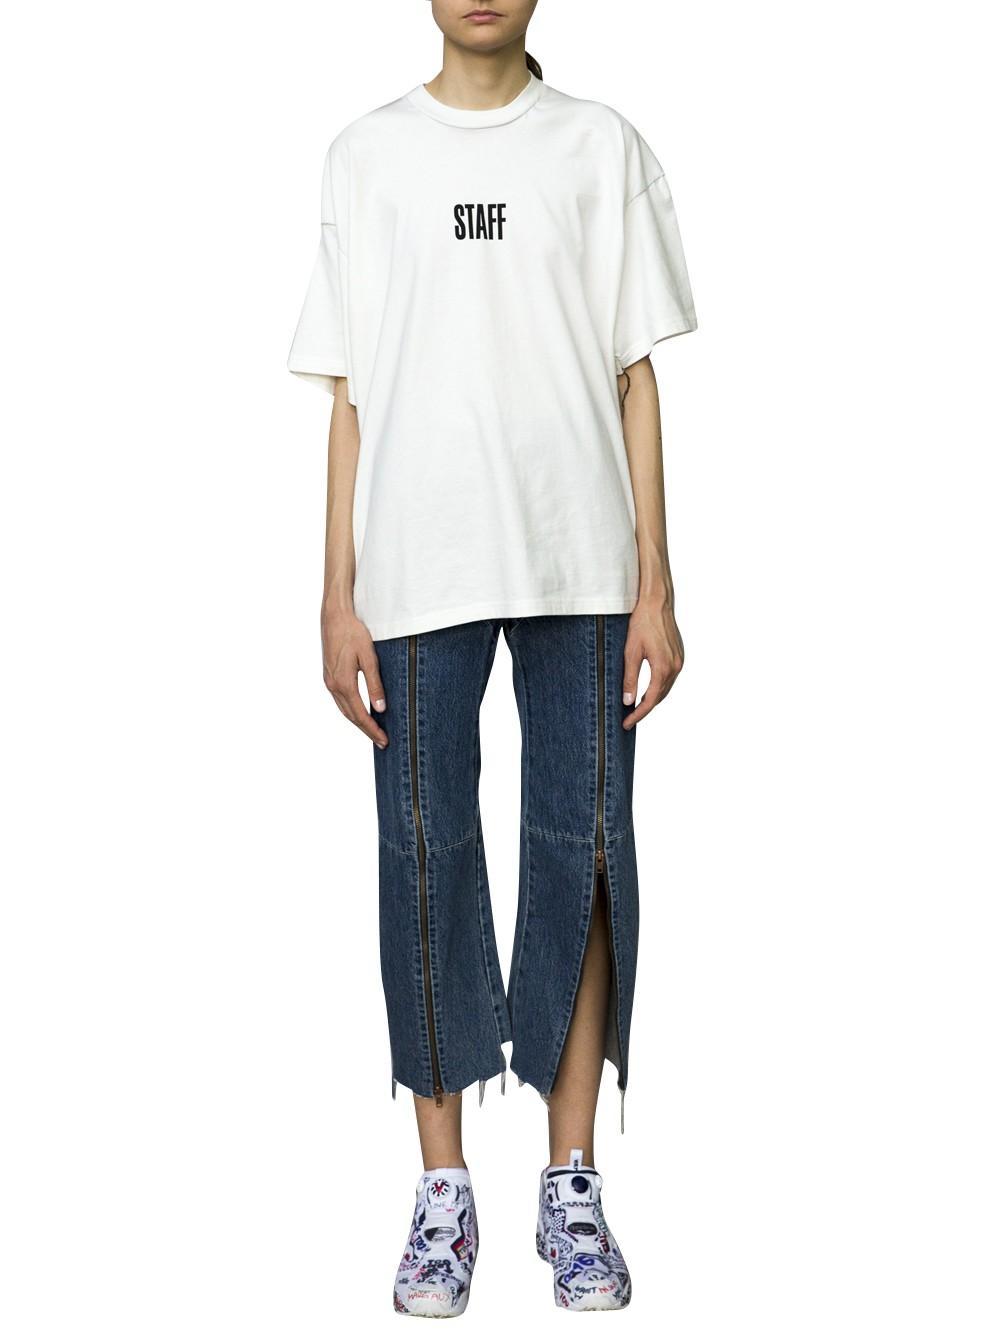 Vetements x hanes 39 staff 39 t shirt in white lyst for Vetements basic staff t shirt